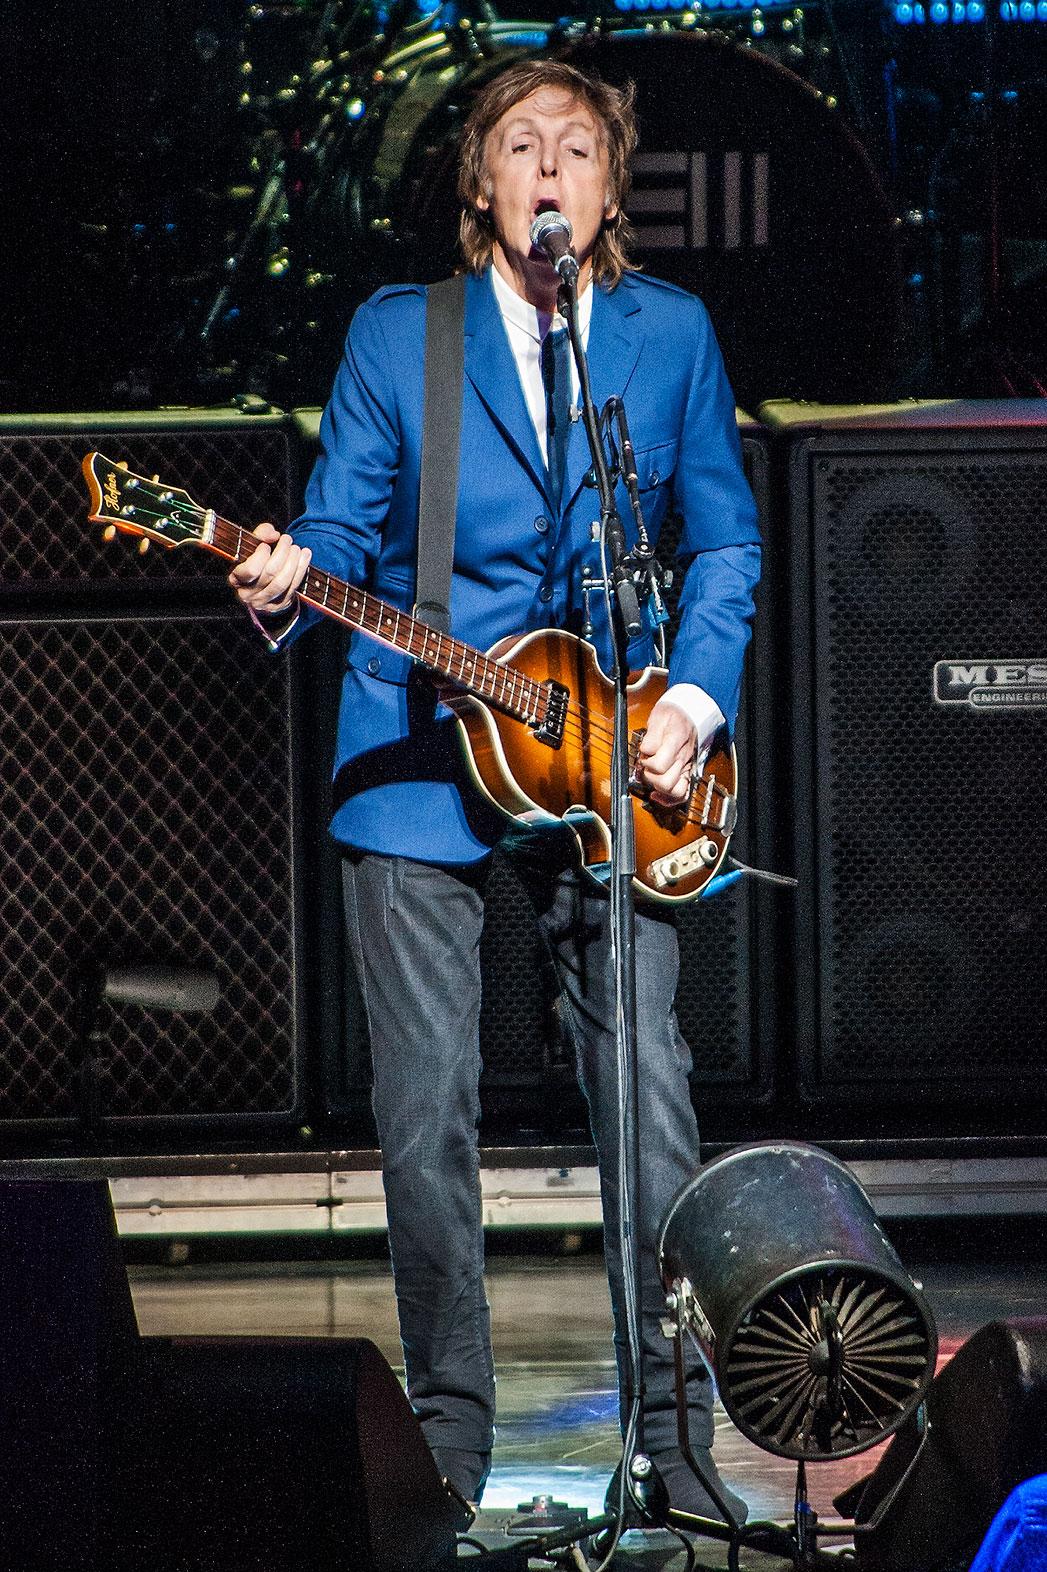 Paul McCartney Concert - P 2014